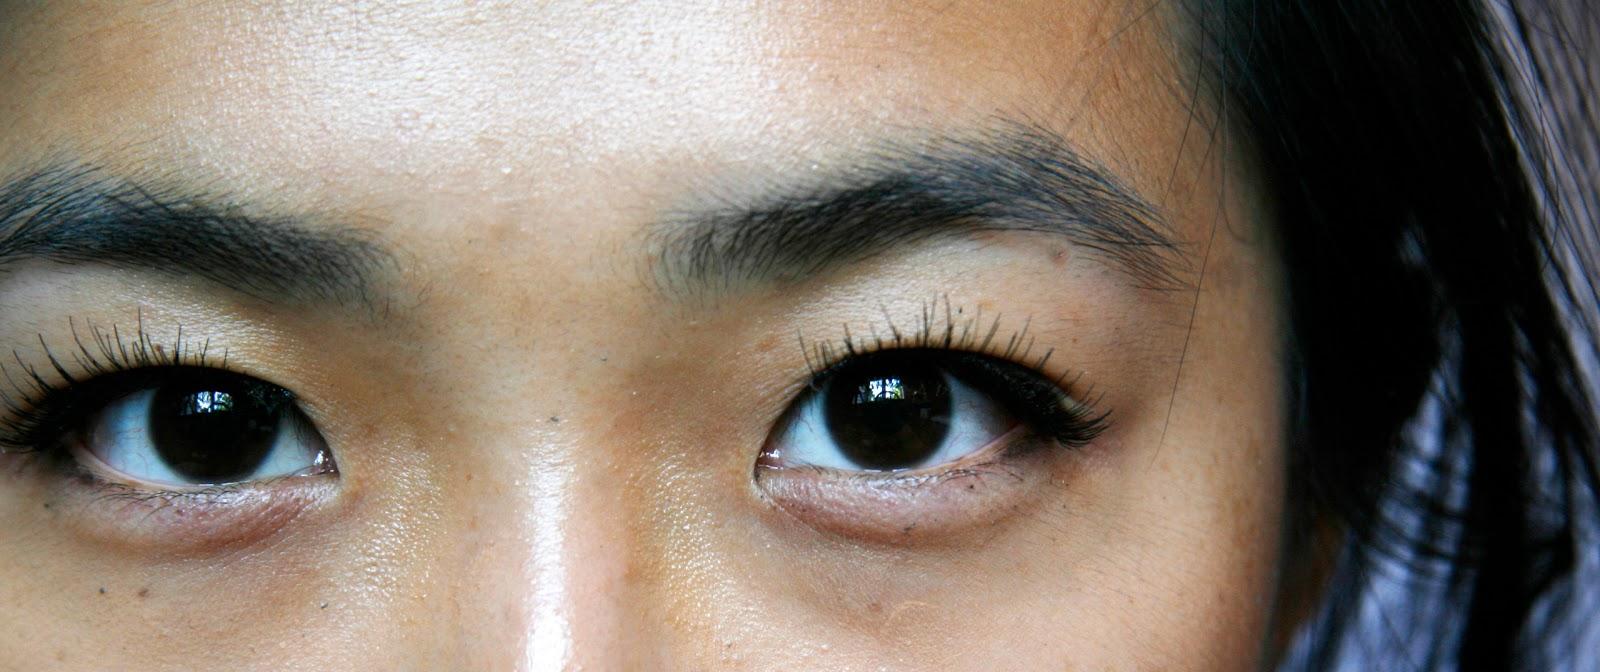 fun size beauty: Beauty n00b: False Lashes